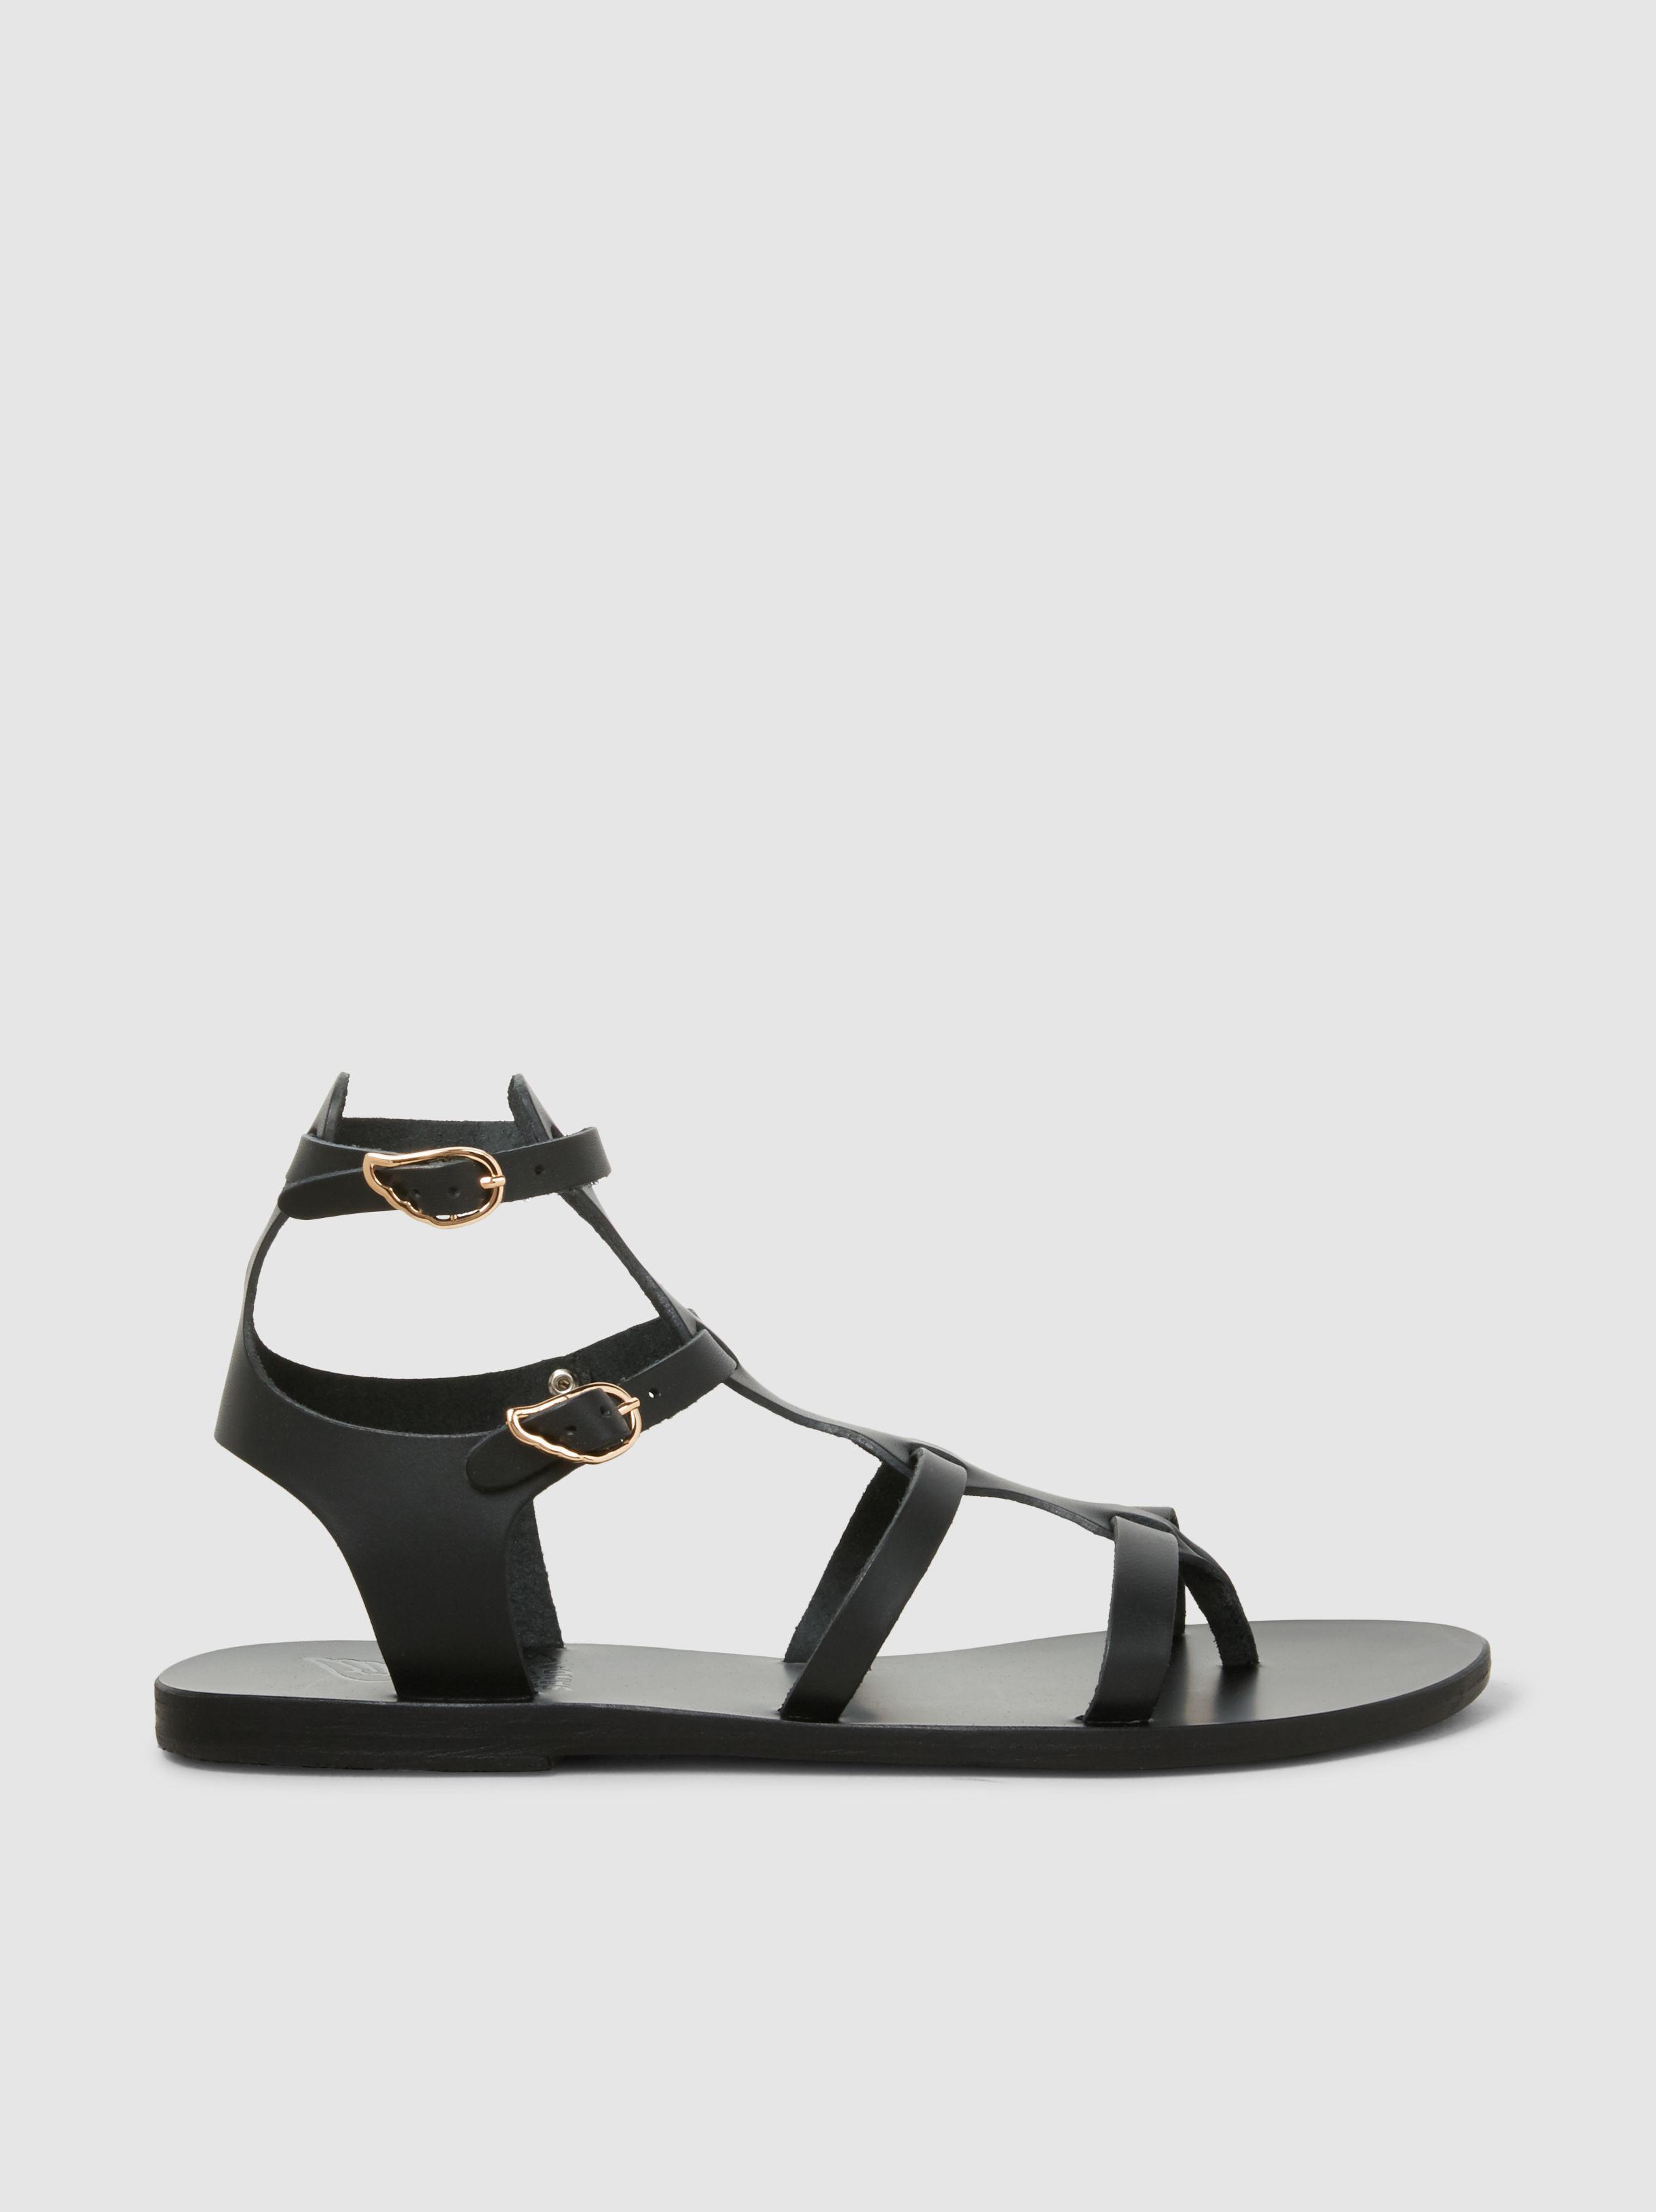 32562ff8e92 Lyst - Ancient Greek Sandals Stephanie Vachetta Leather Sandals in Black